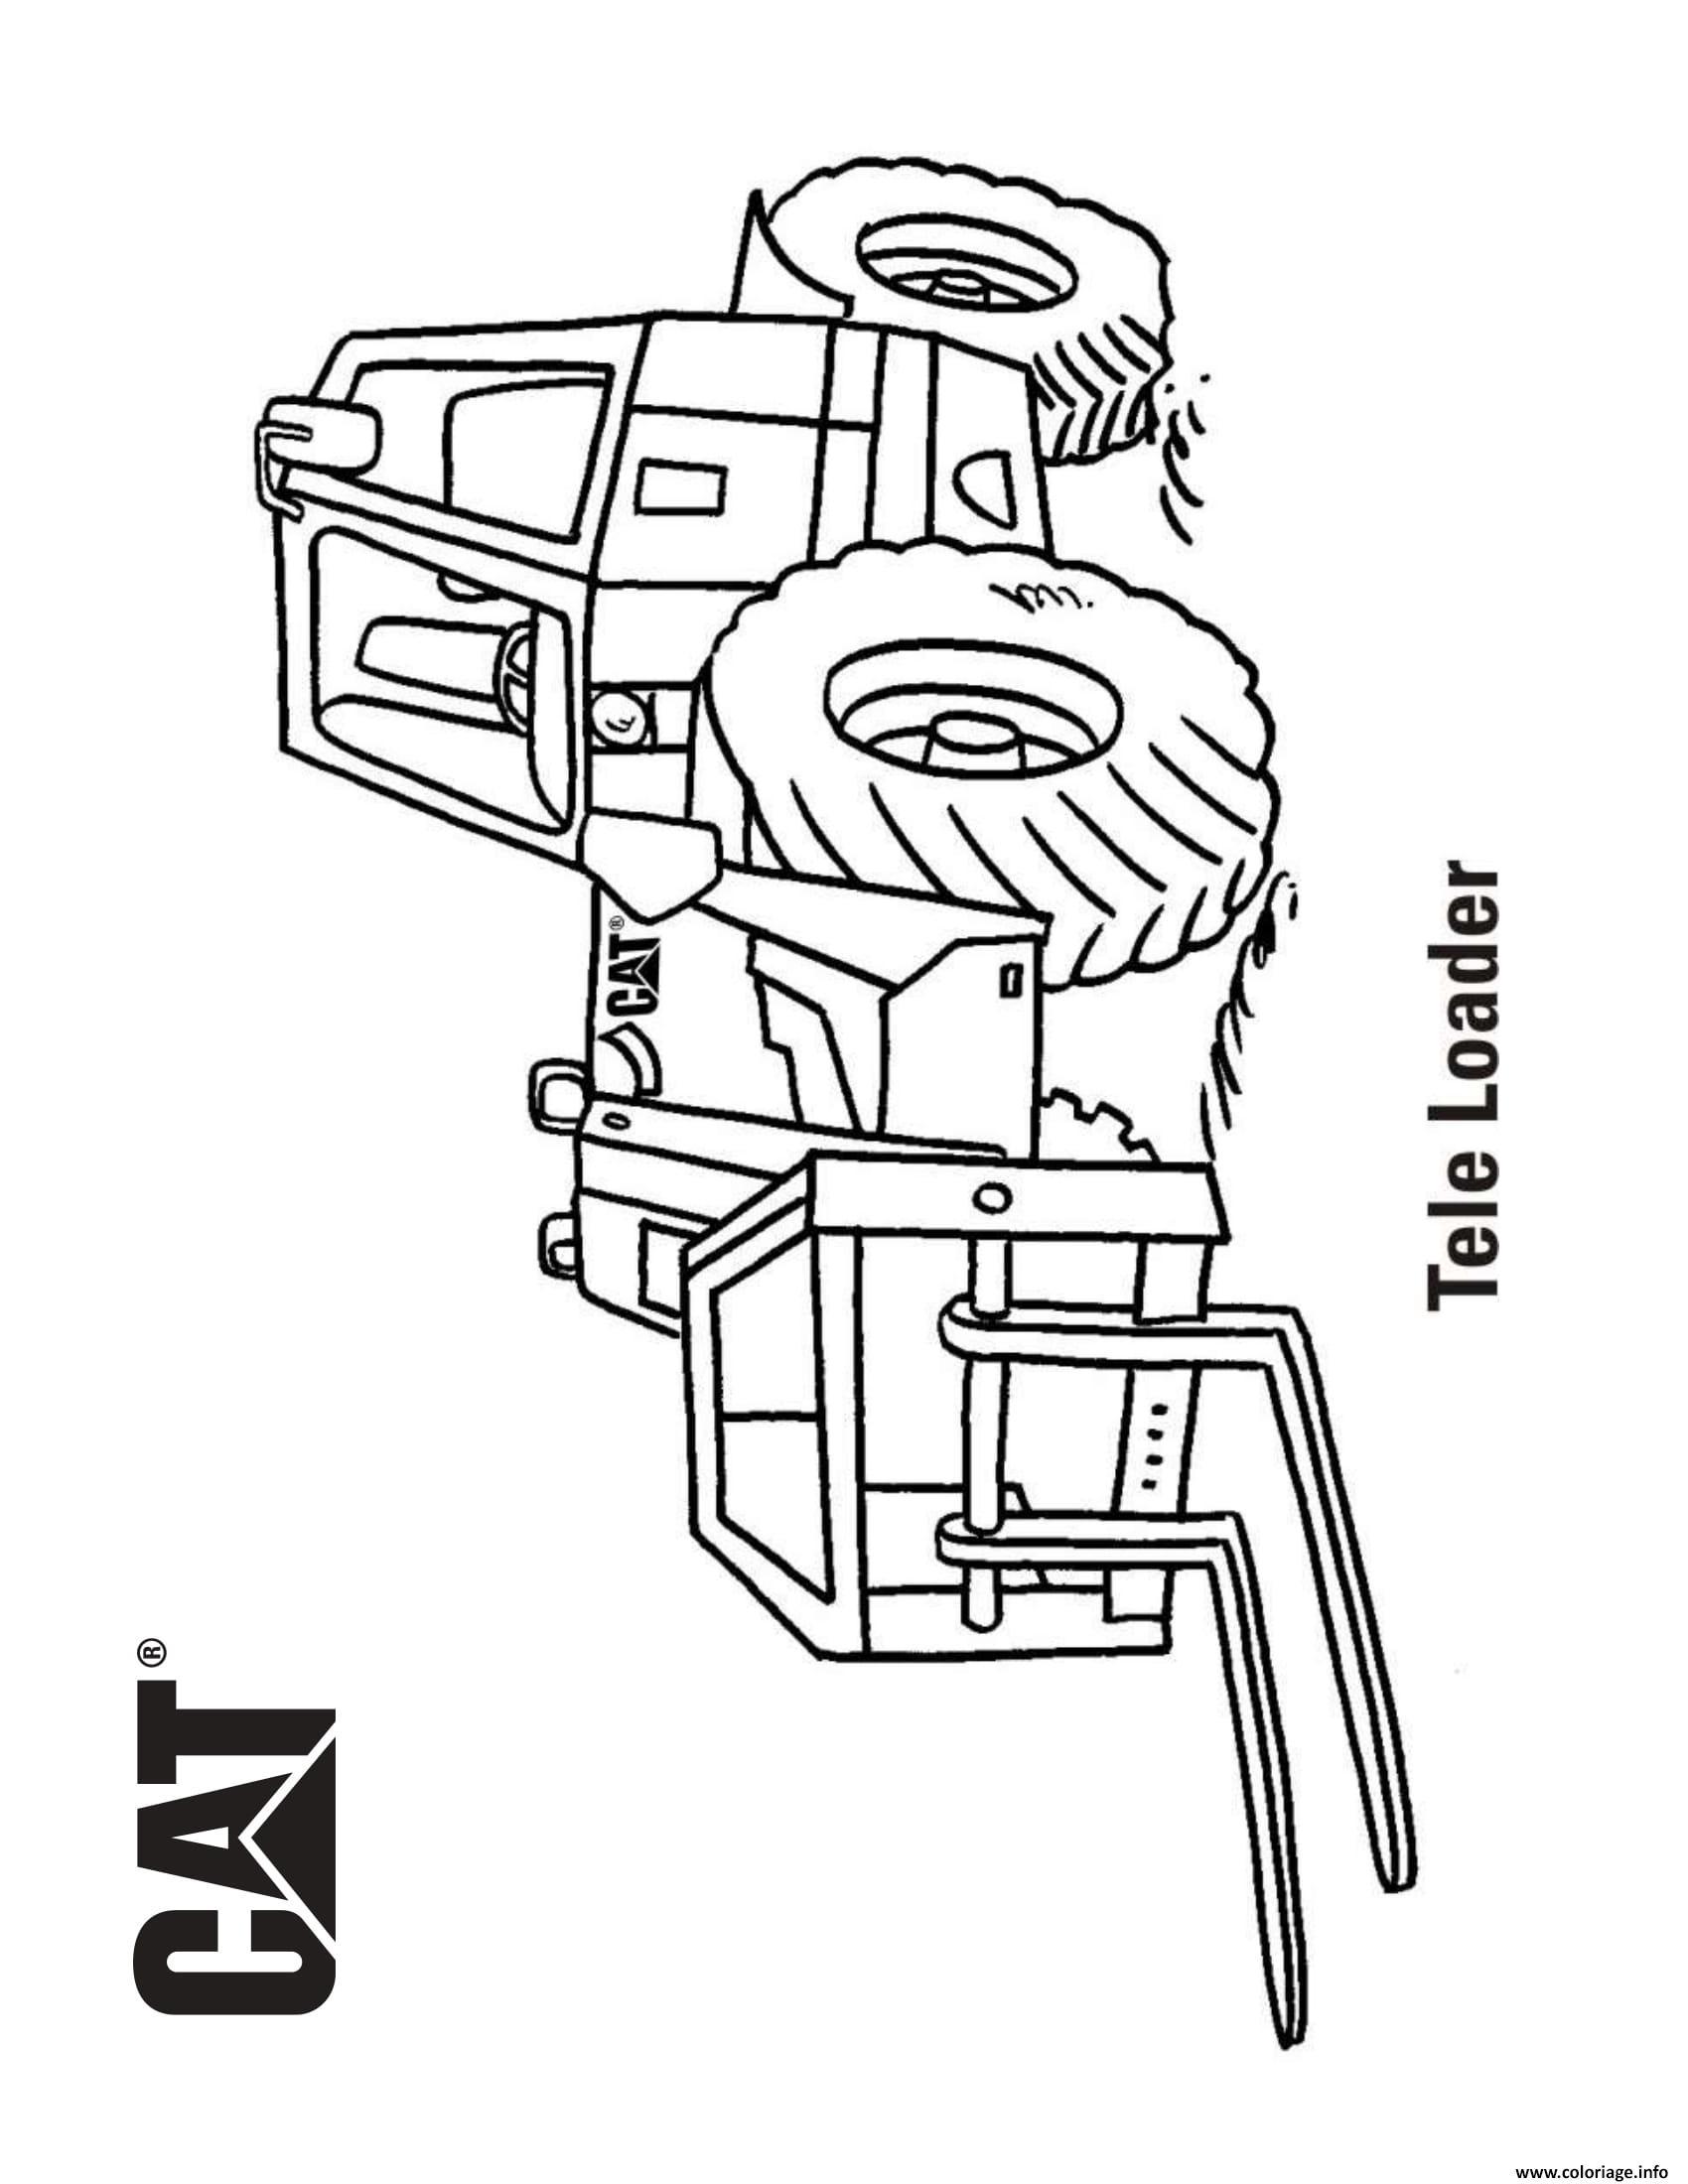 Coloriage Tele Loader Camion dessin